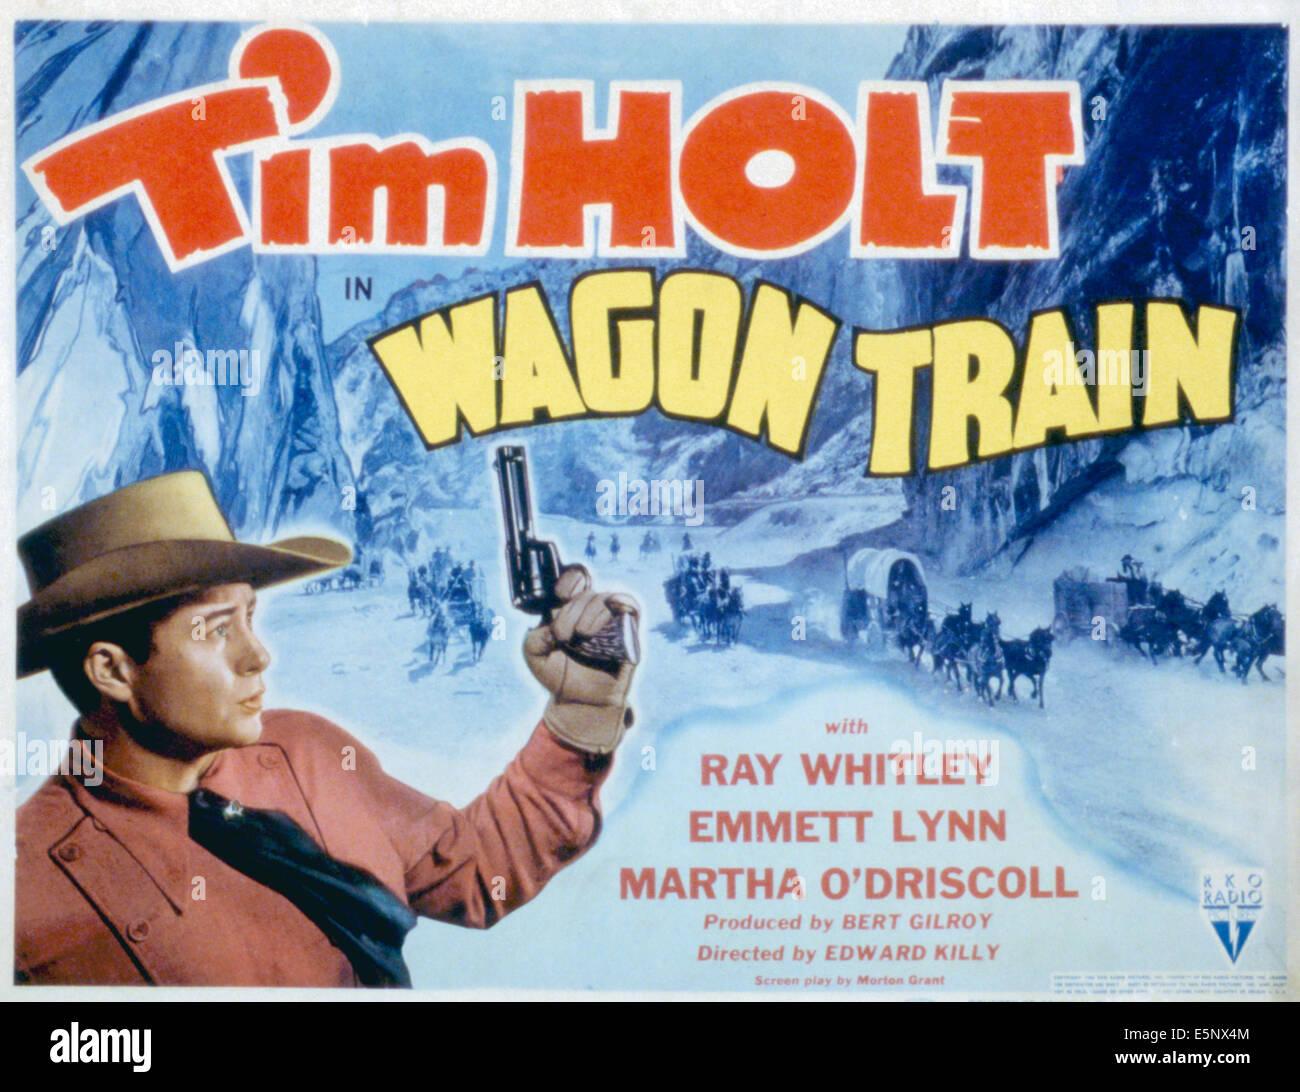 WAGON TRAIN, Tim Holt, 1940. - Stock Image